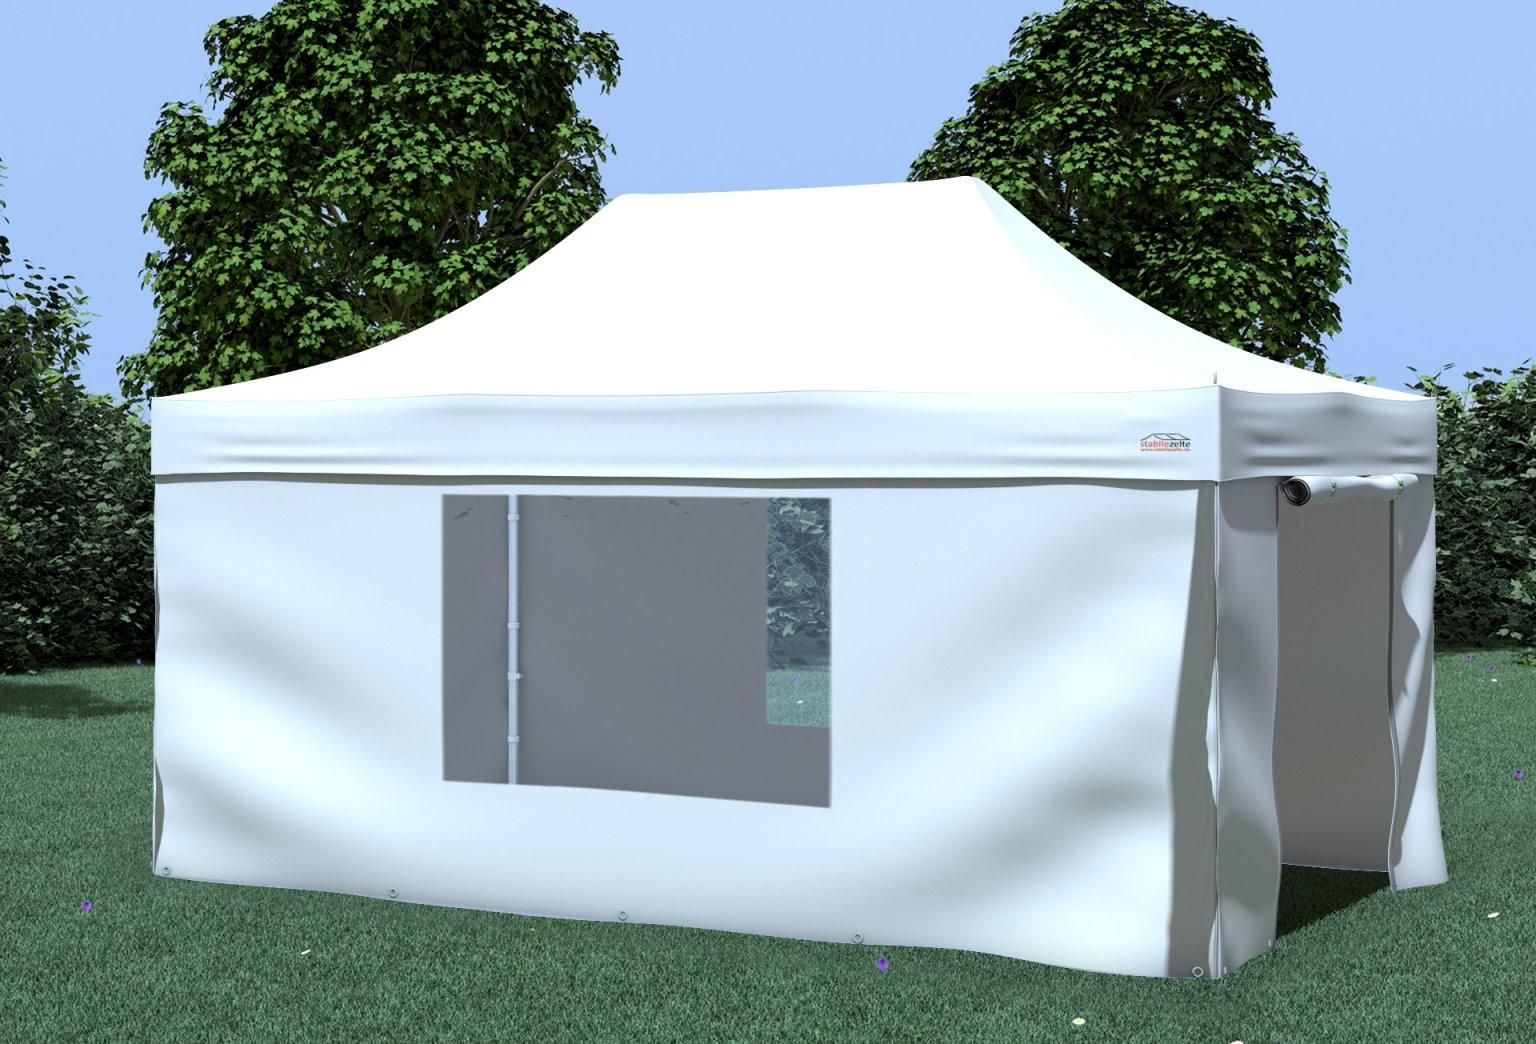 3X45 M Faltpavillon Prof+ Polyester 330 Gm² Weiß Inkl von Faltpavillon 3X4 5 Wasserdicht Bild